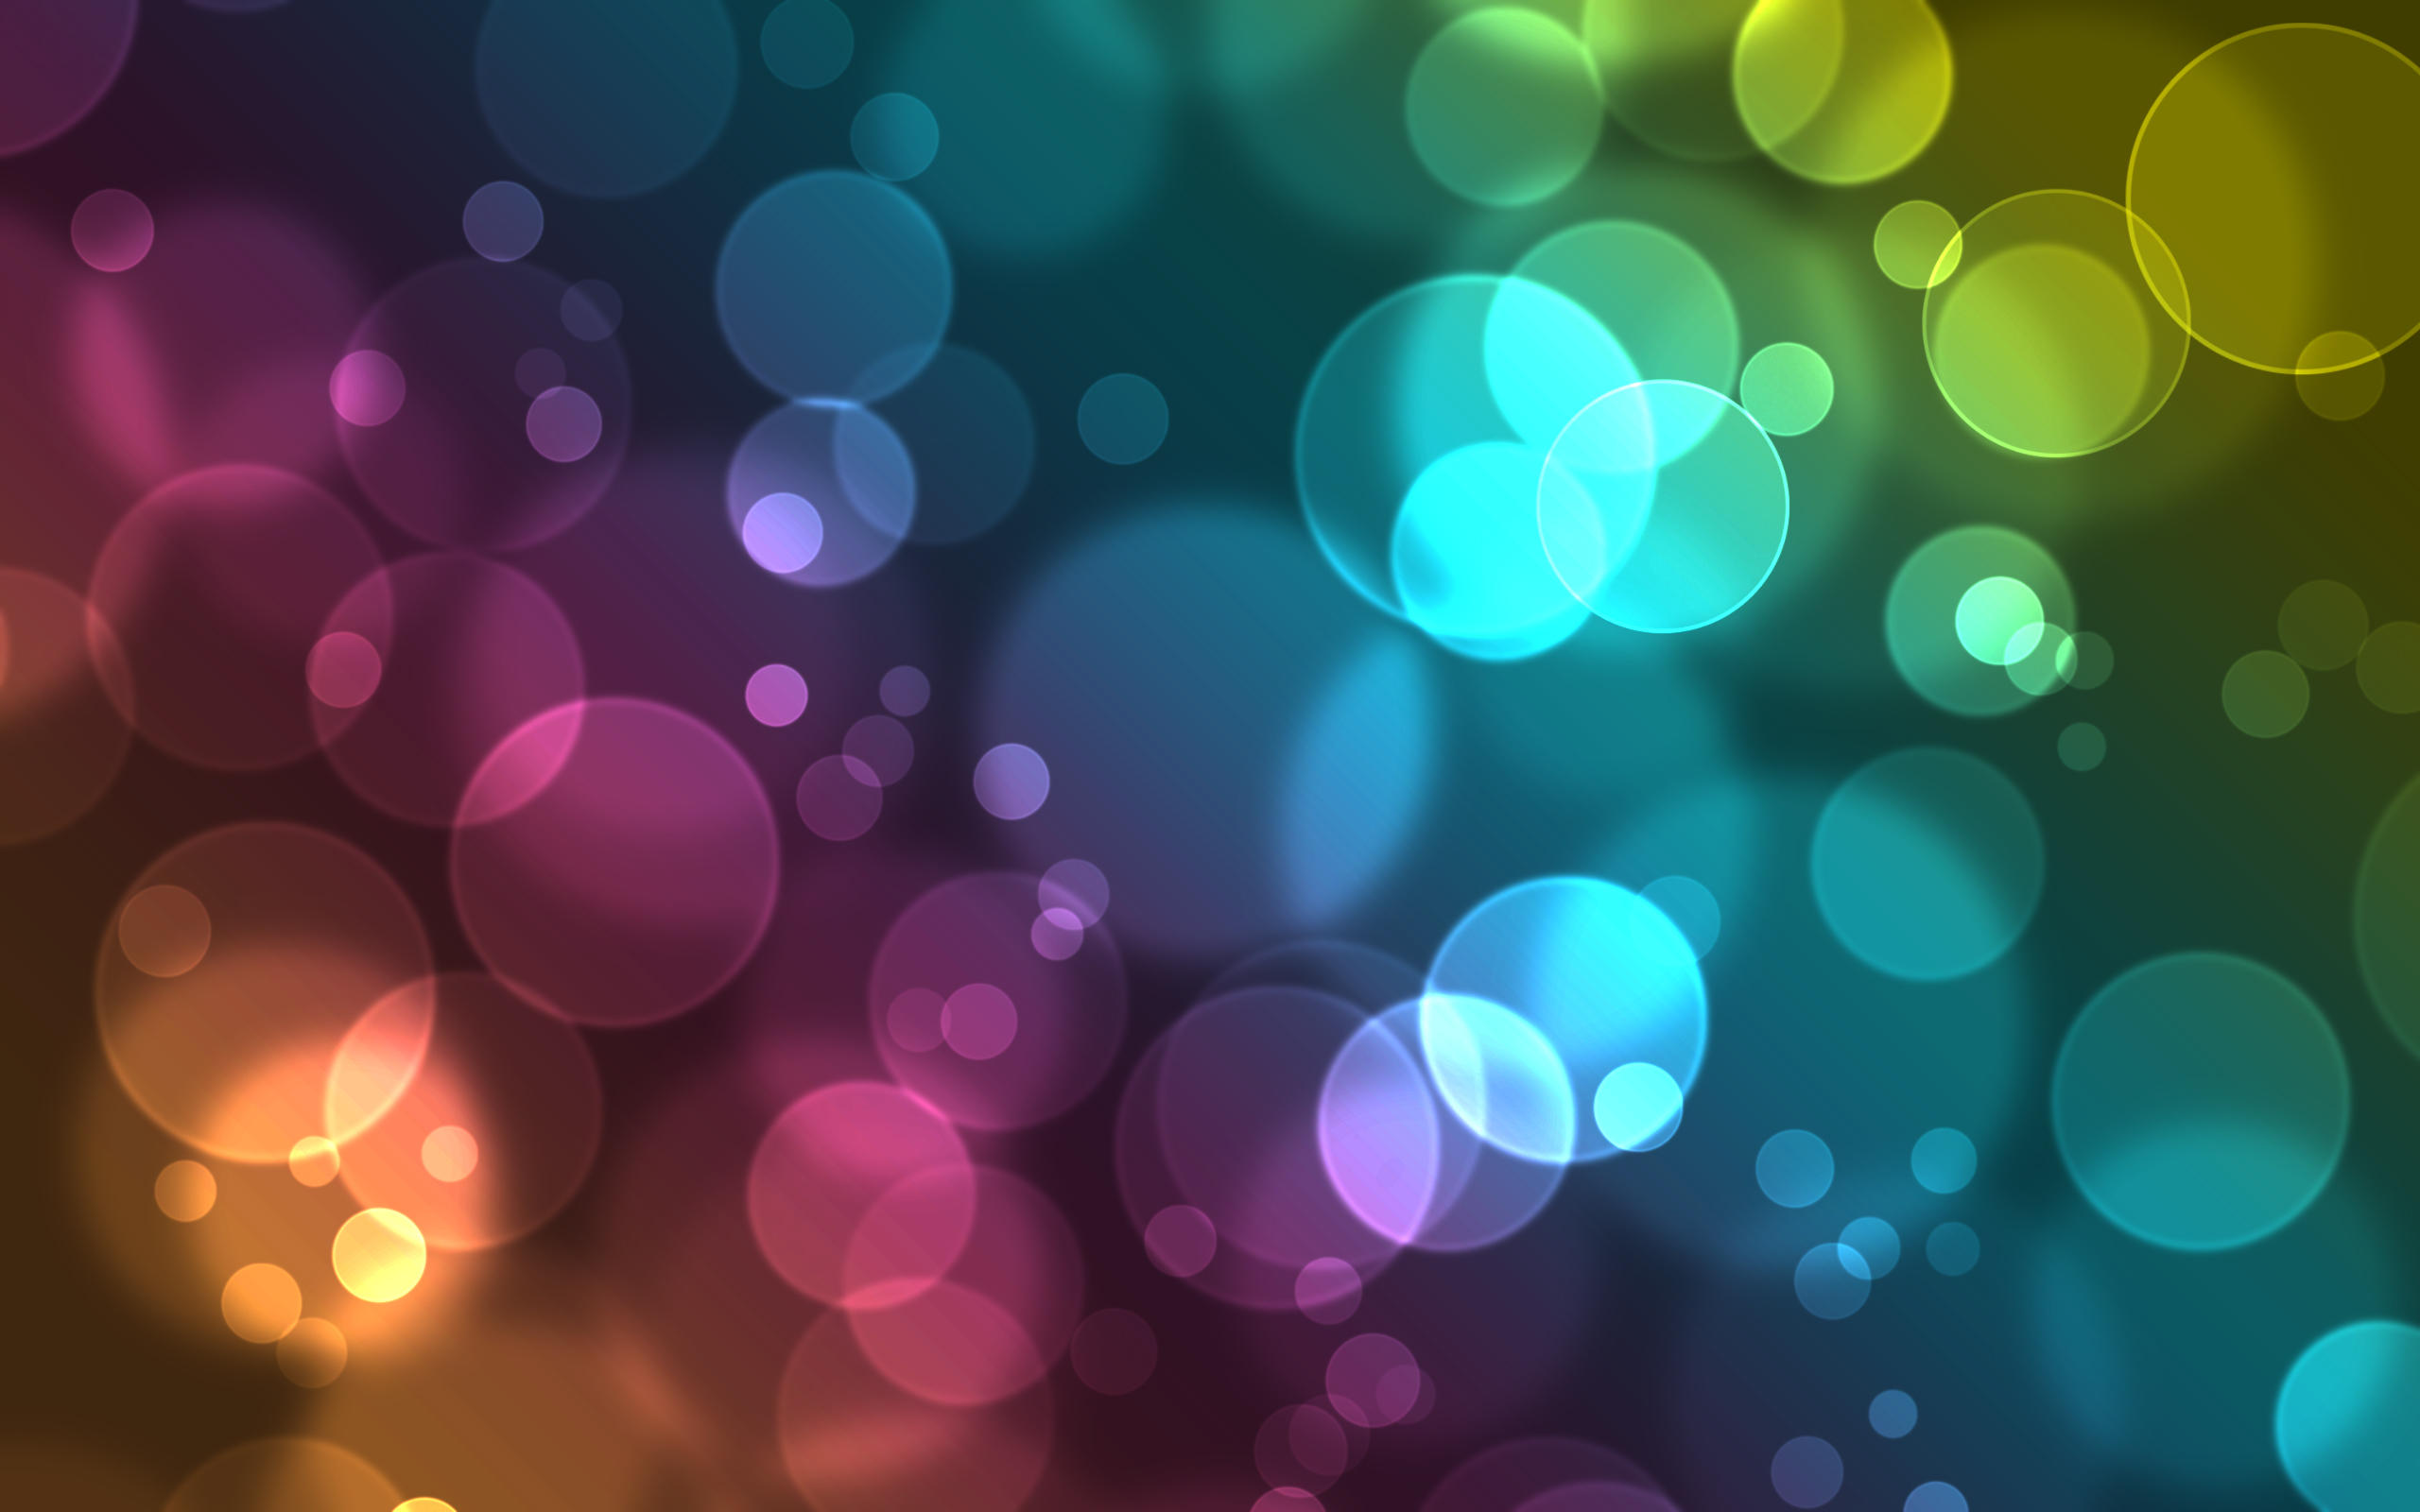 Candle Wallpaper Hd Rainbow Bokeh By Favsco On Deviantart